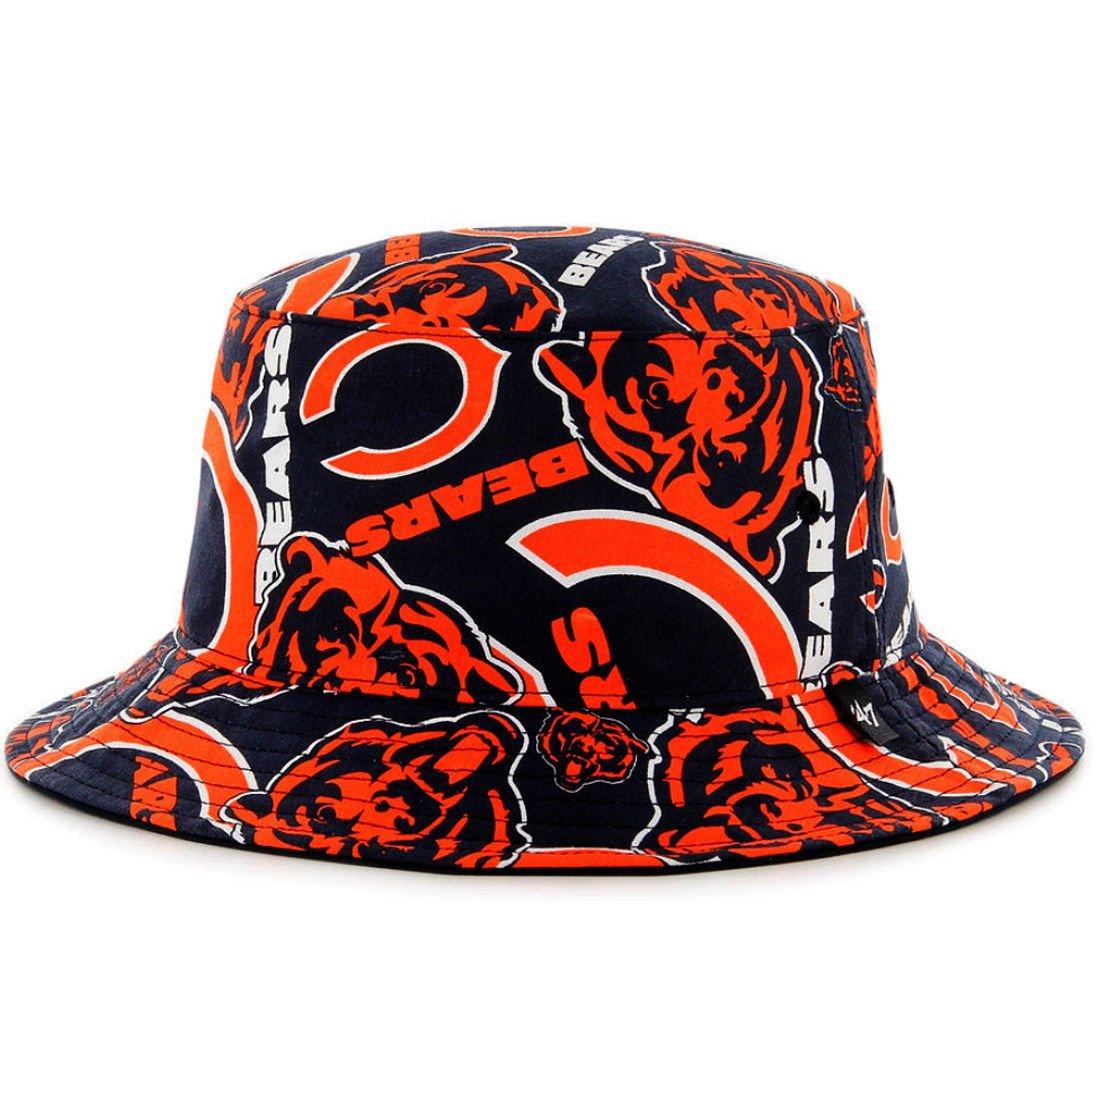 Amazon.com    47 Chicago Bears Bravado Printed All Over Bucket Hat - NFL  Gilligan Fishing Cap   Sports   Outdoors 2cf4ef5259a9